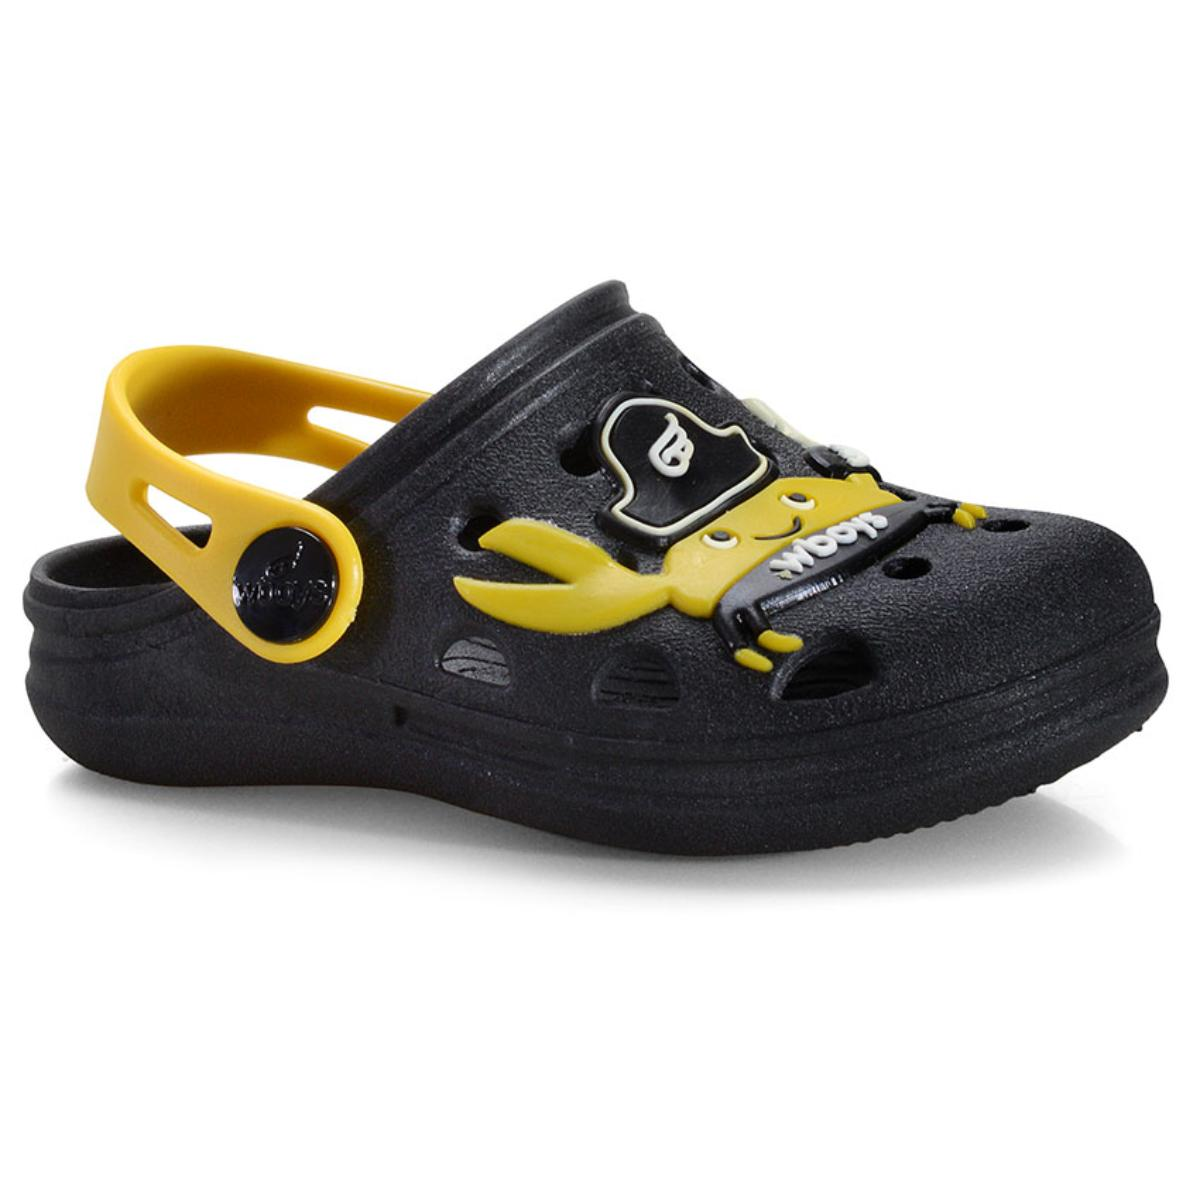 Babuche Masc Infantil World Colors 126.014 Preto/amarelo